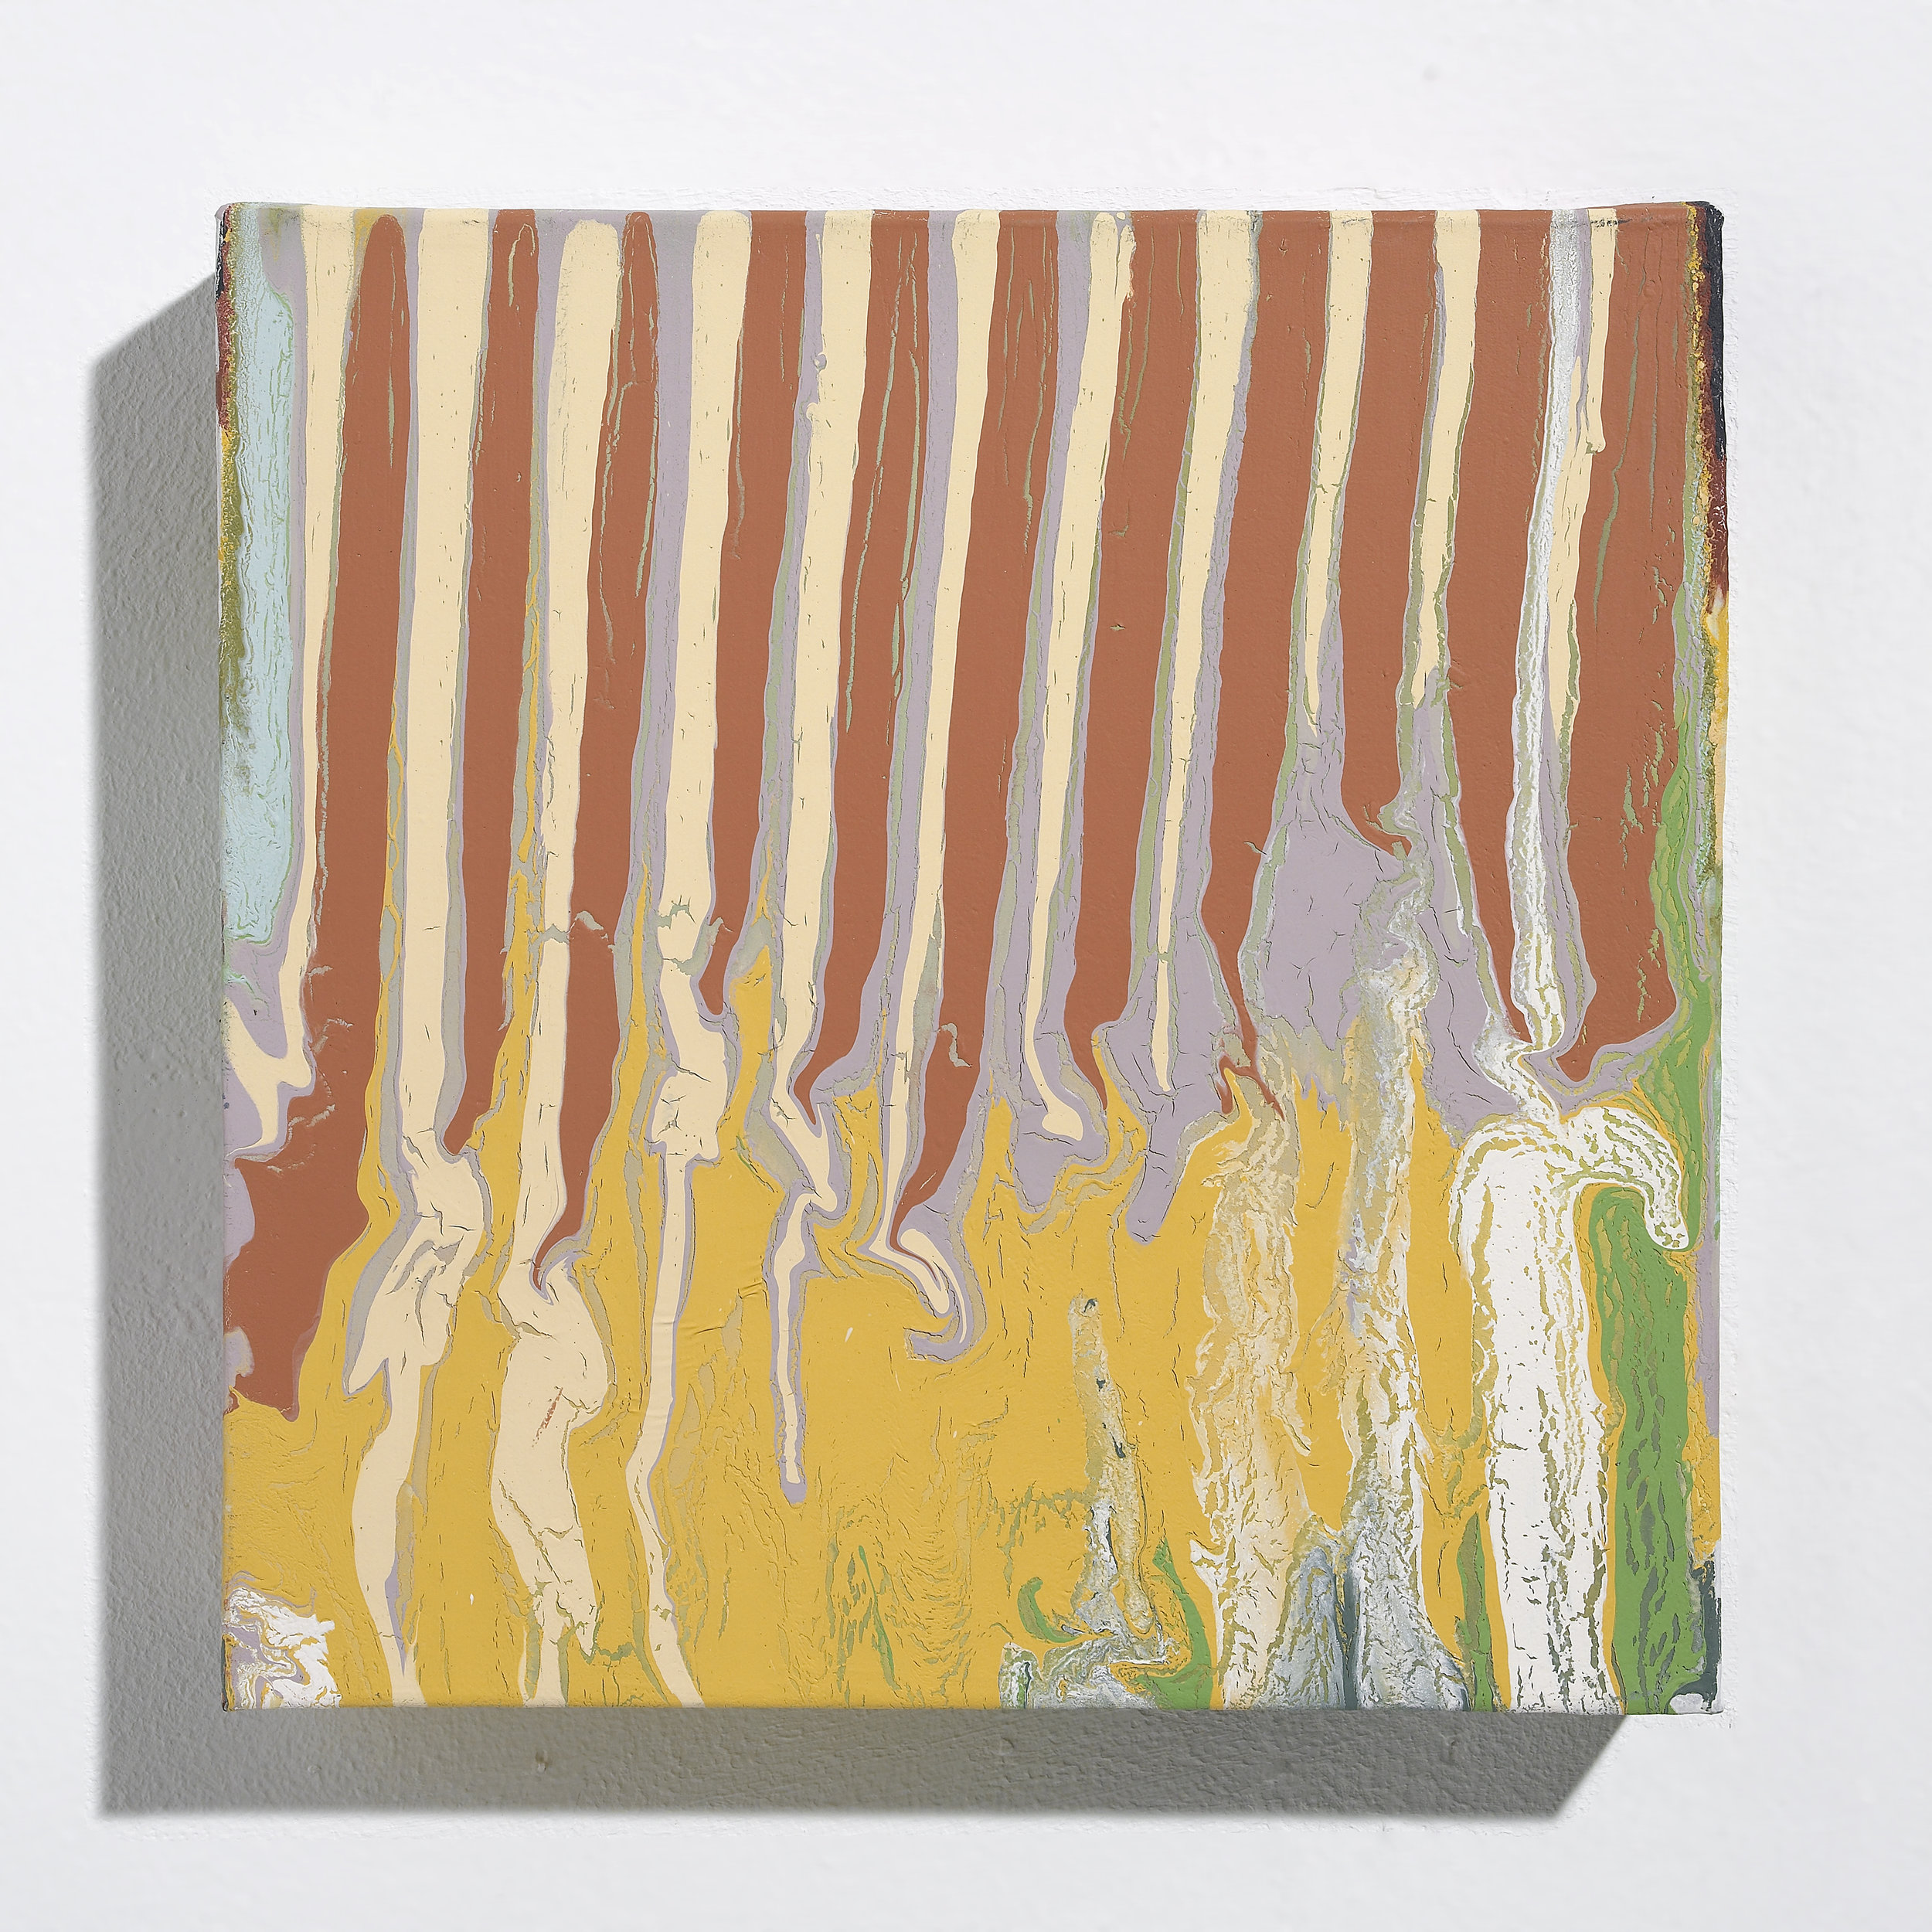 Acrylic Paint Dripping Studies I